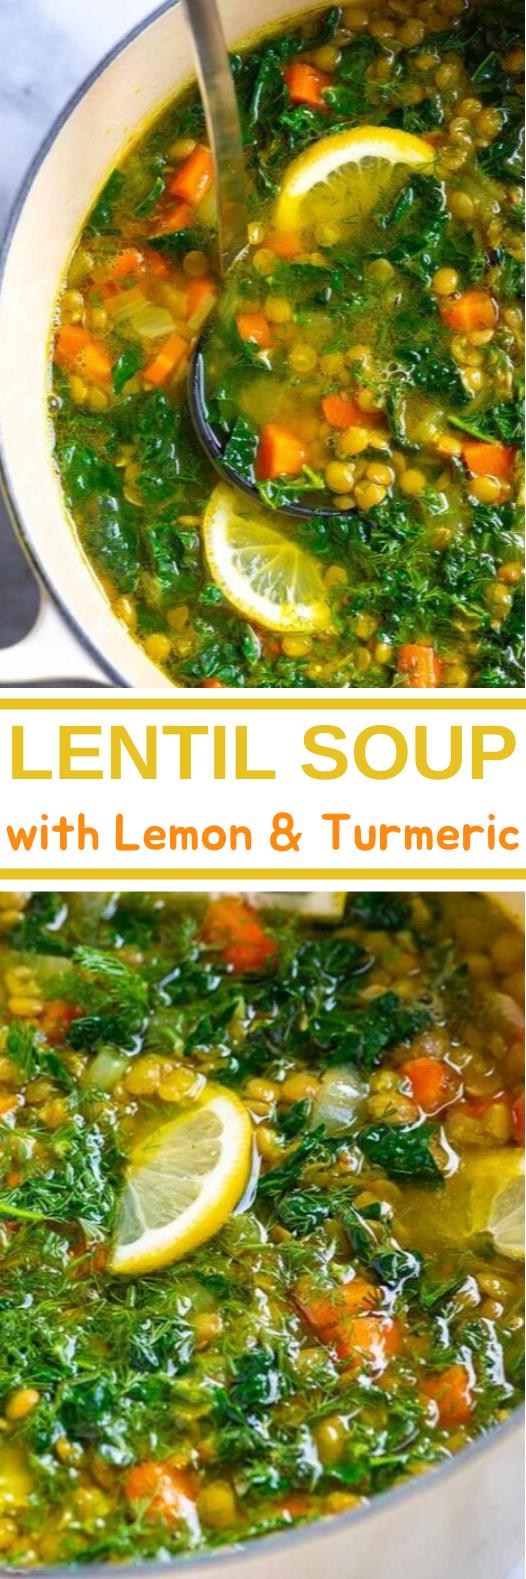 Lentil Soup with Lemon and Turmeric #vegan #healthy #glutenfree #recipe #soup